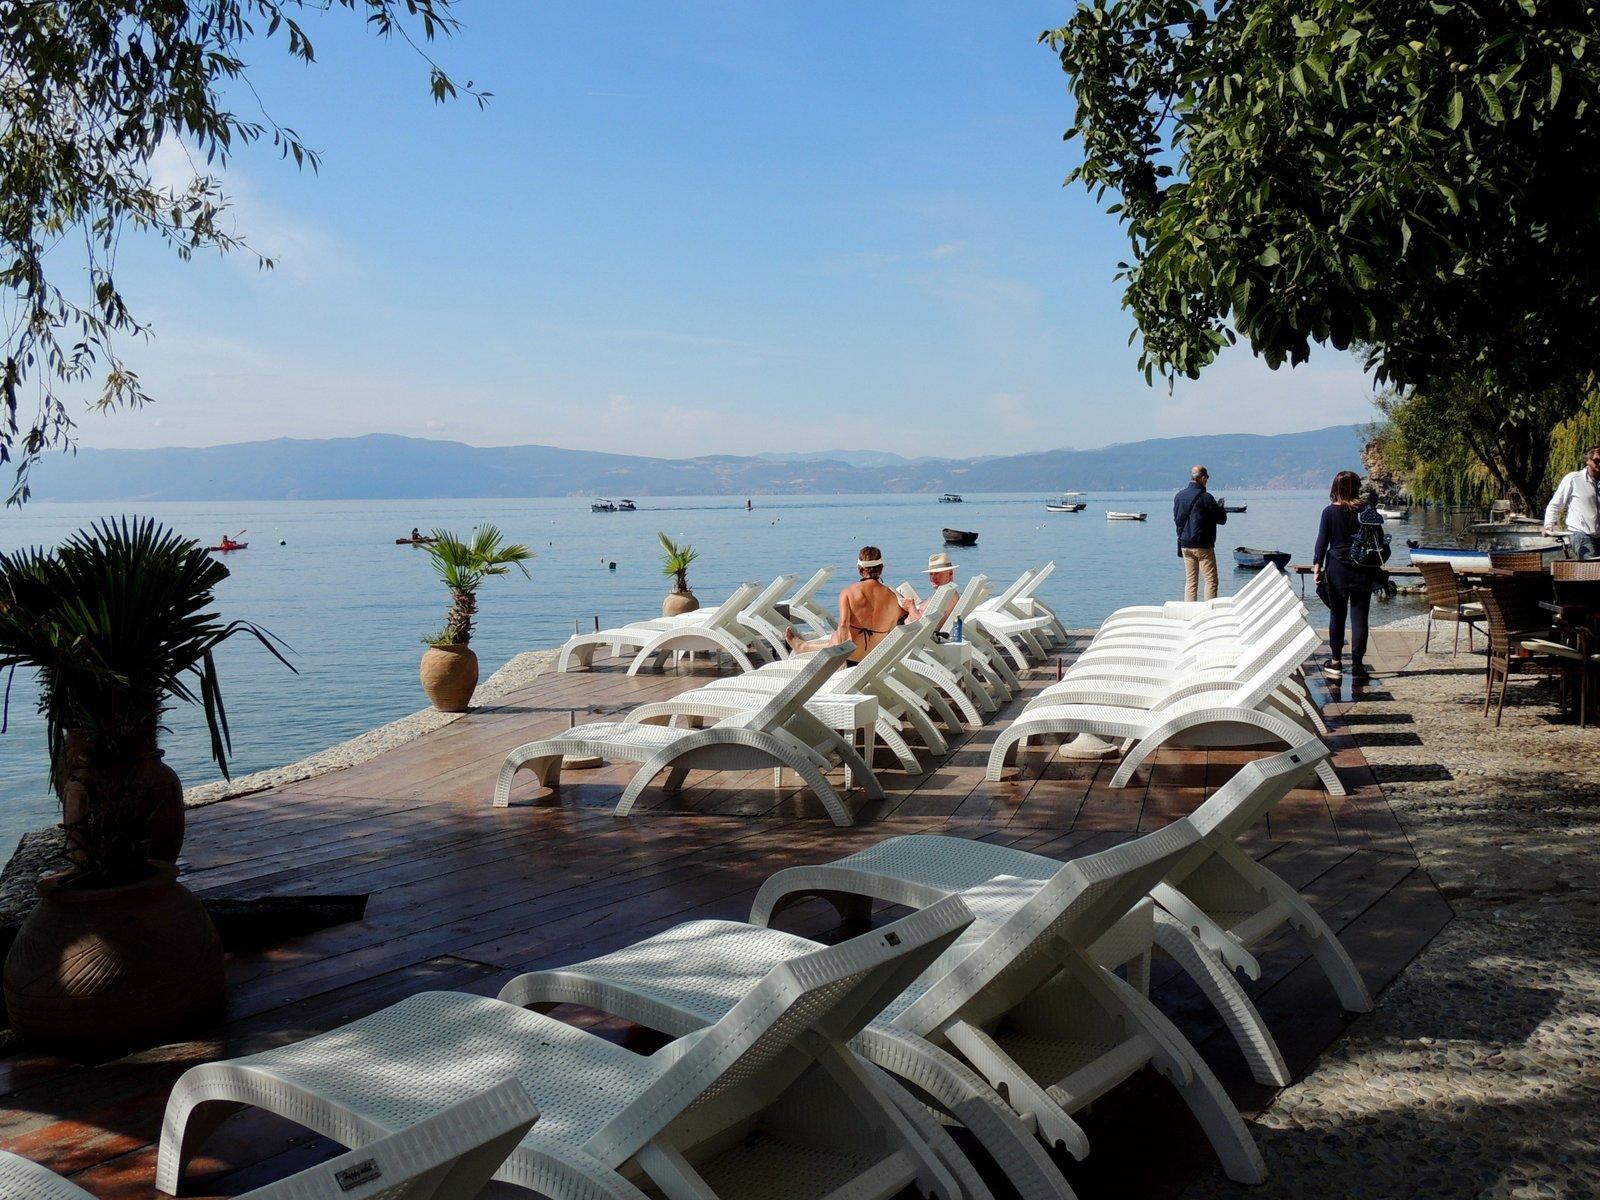 Strandbad in Ohrid mit Blick auf Albanien